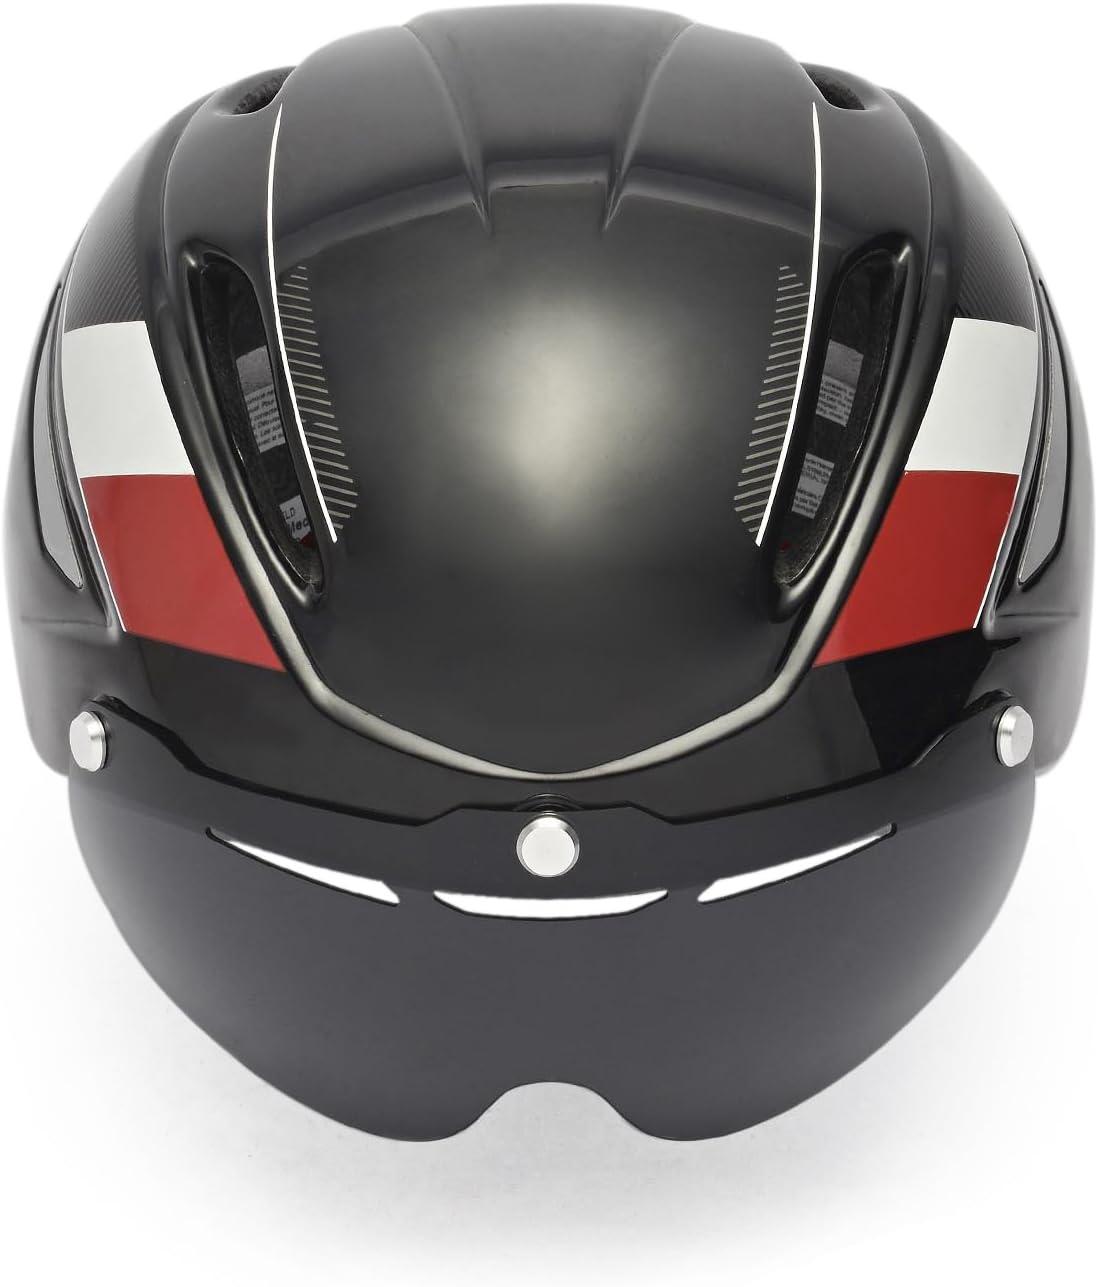 2pcs Anti-Impact Cycling Helmet Replacement Lens Bike Helmet Glasses Goggles Len